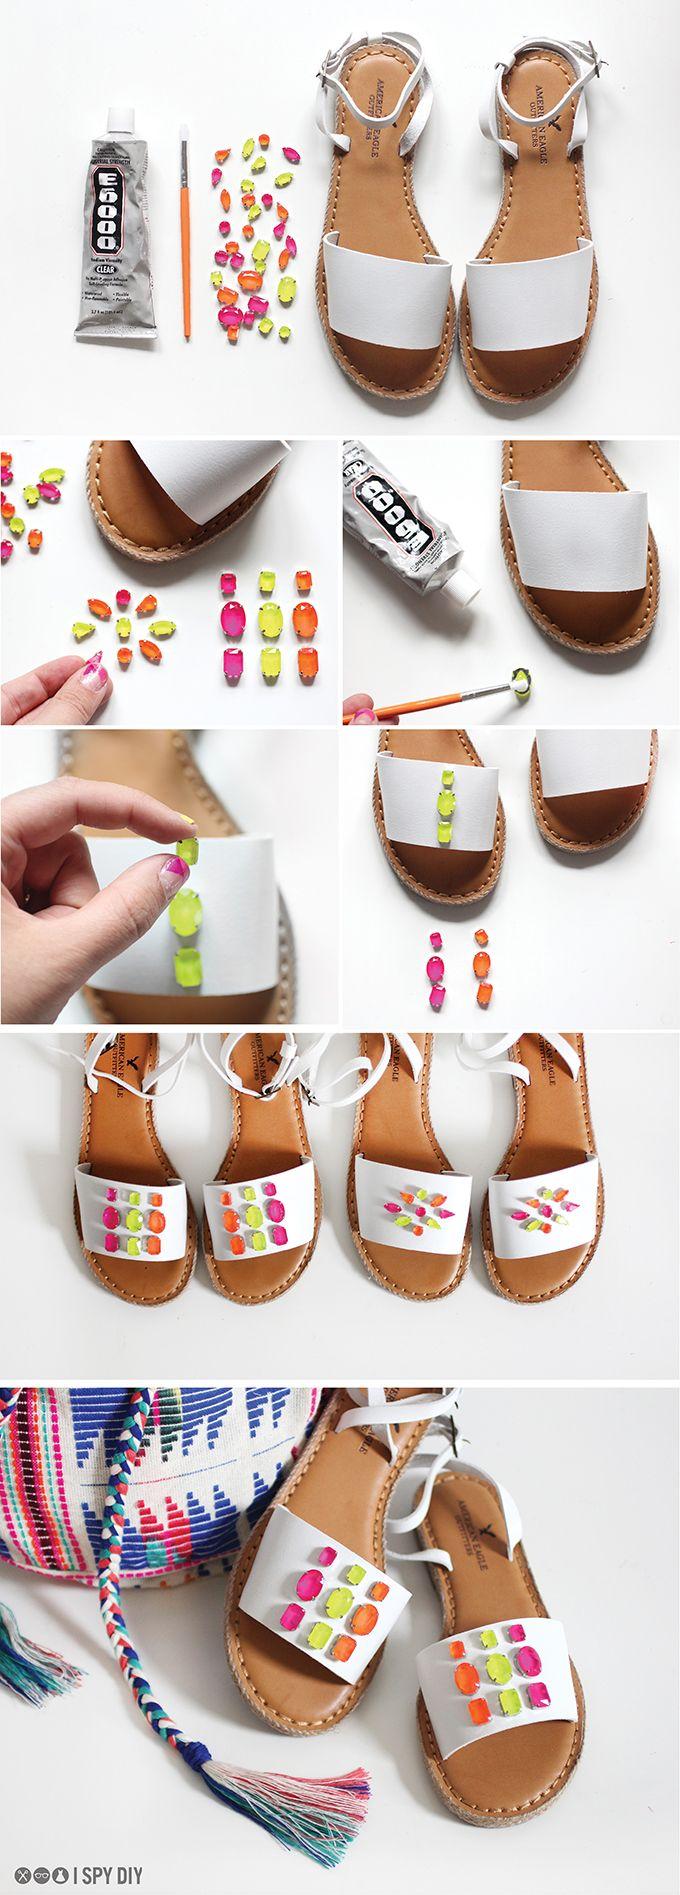 Una idea original para customizar sandalias #diy #handmade